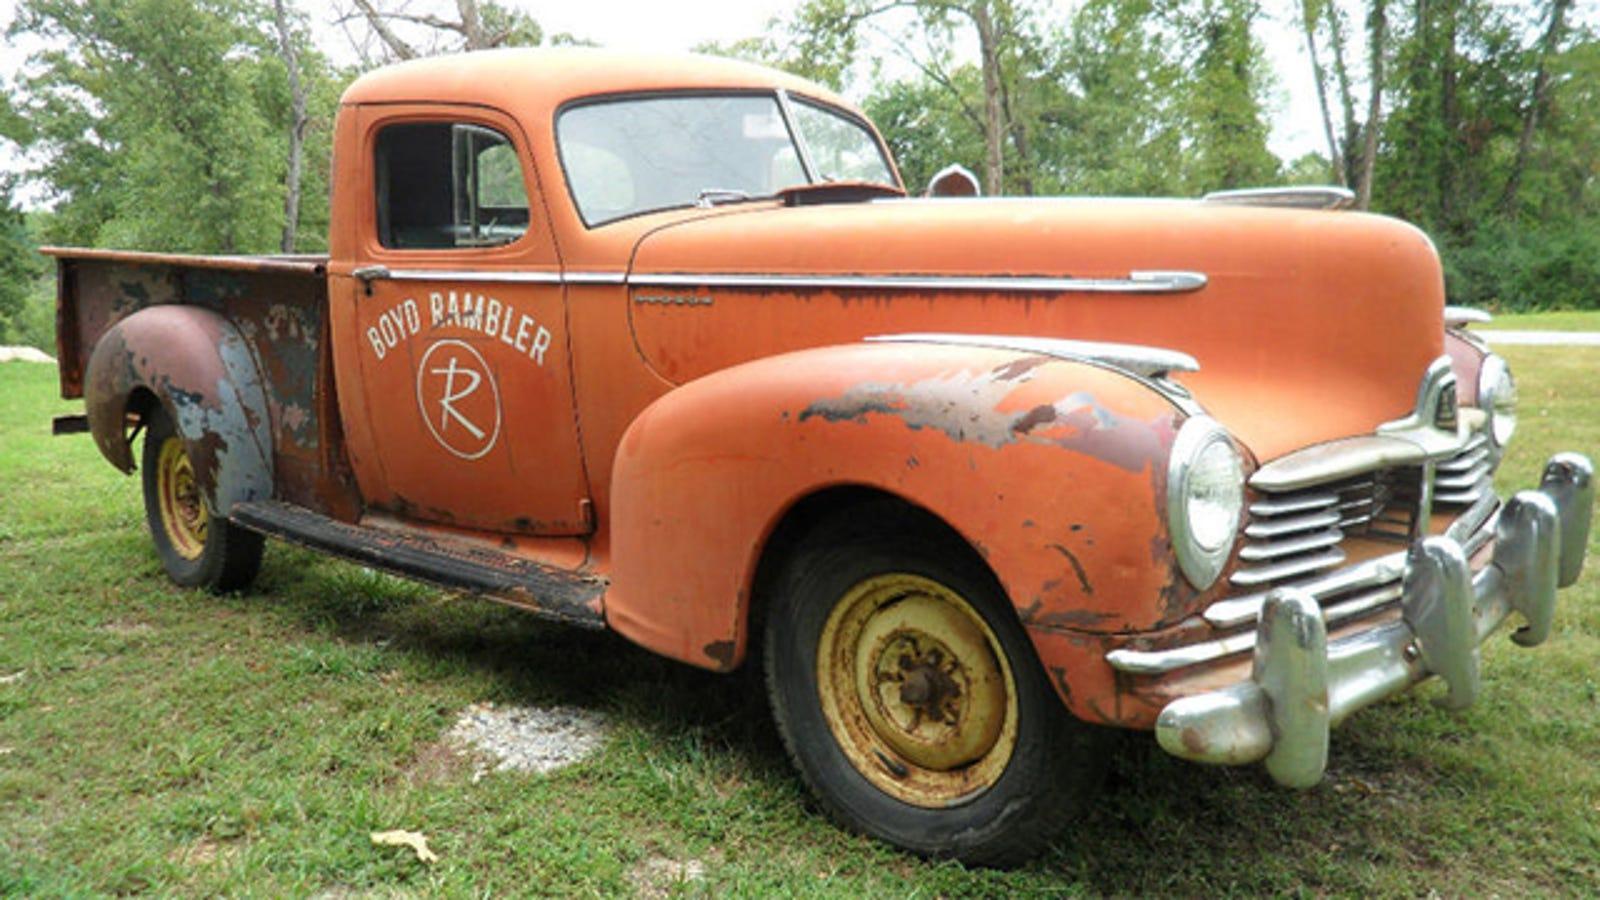 Trucks For Sale: Rare And Original 1947 Hudson Truck For Sale On Ebay